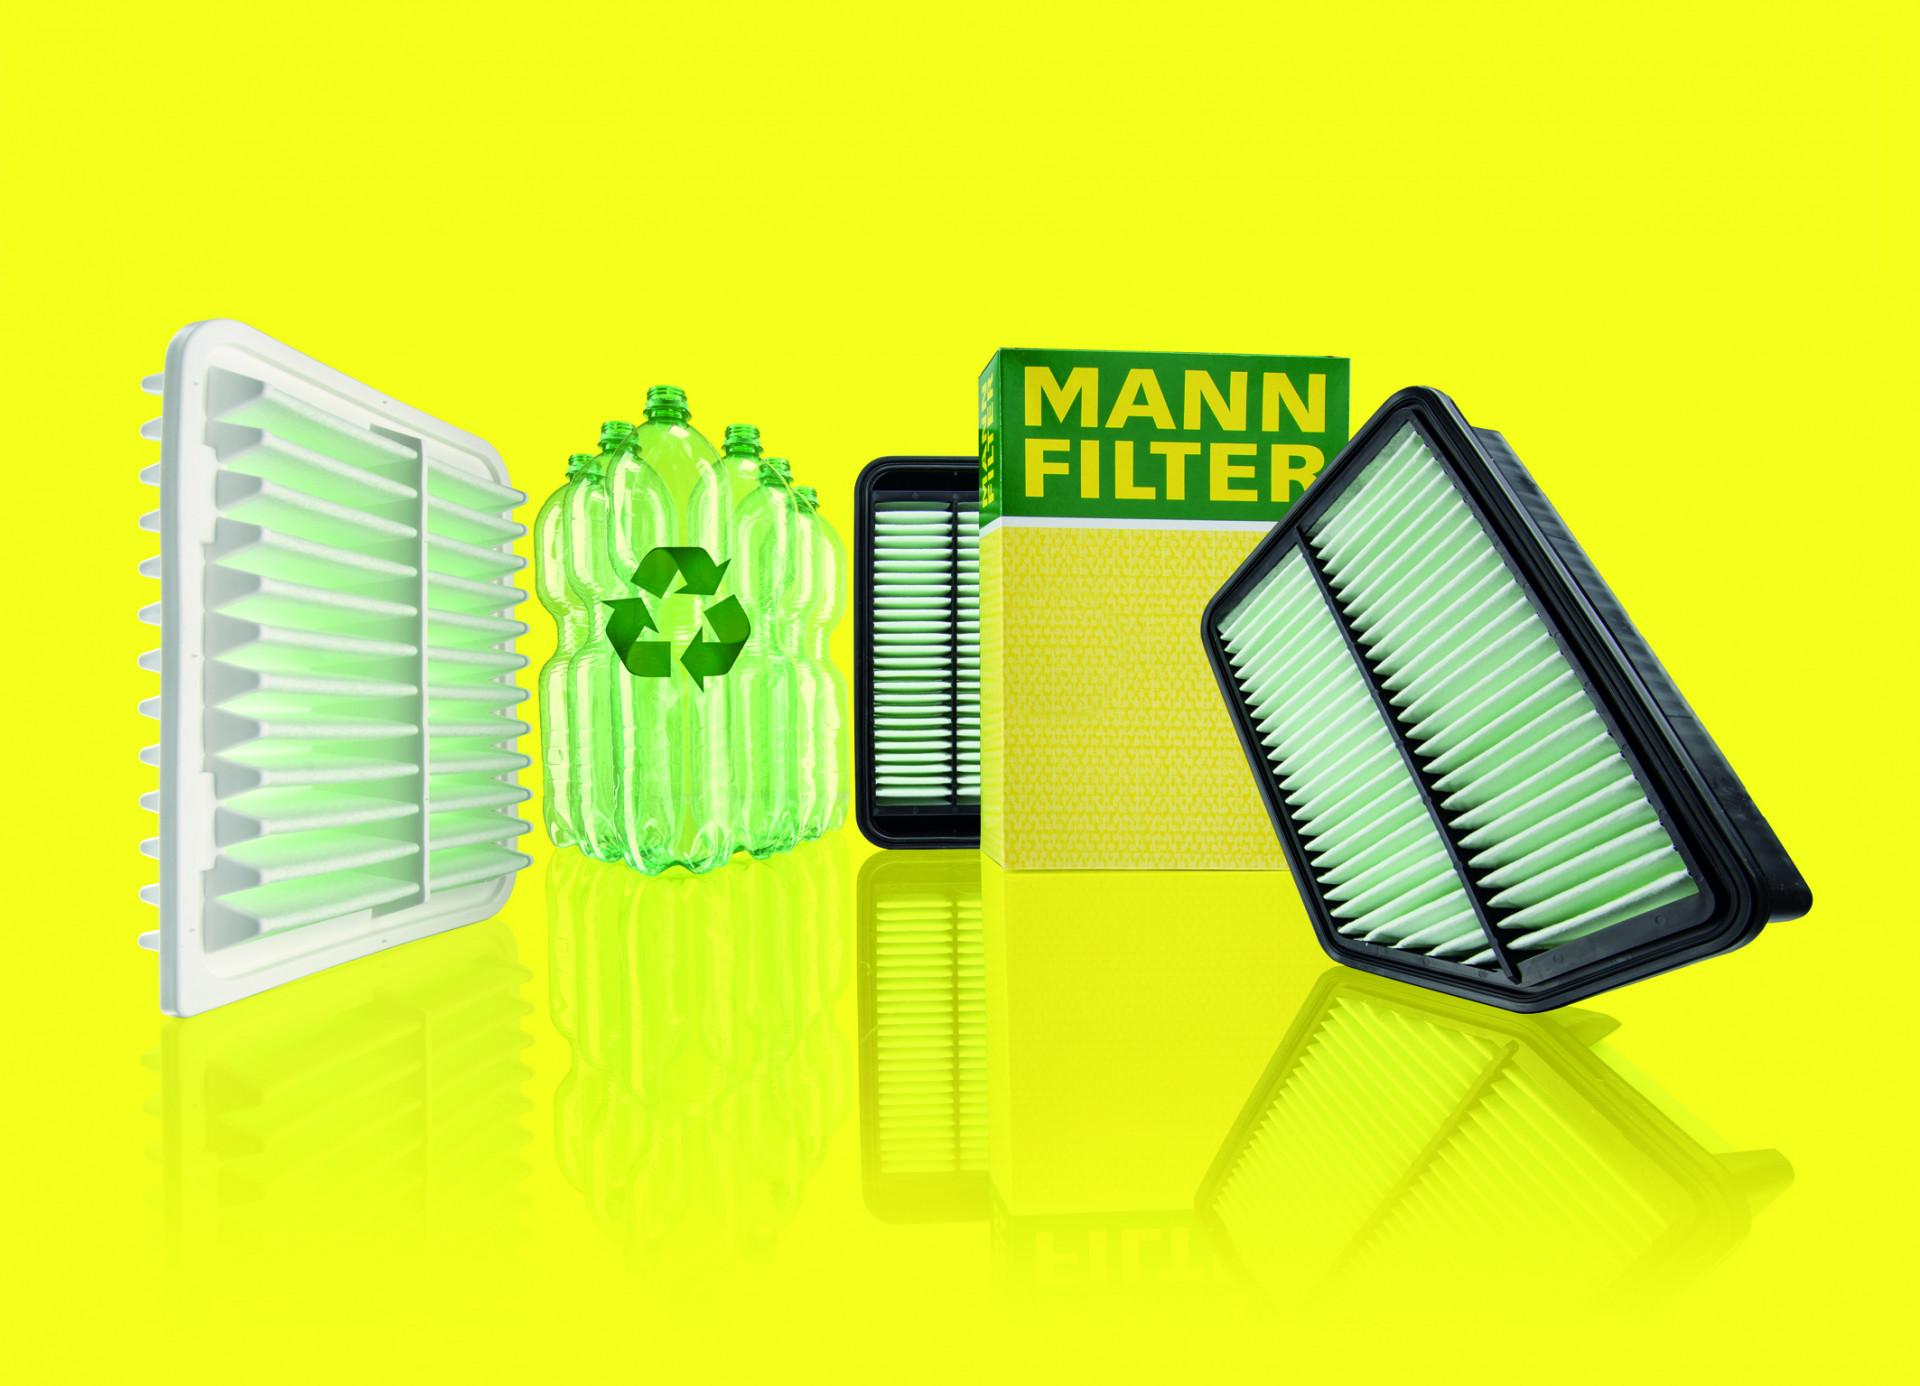 AF_Group_PET Recycling_MF_13x18_3cm_300dpi_CMYK_0719_MHDE.jpg